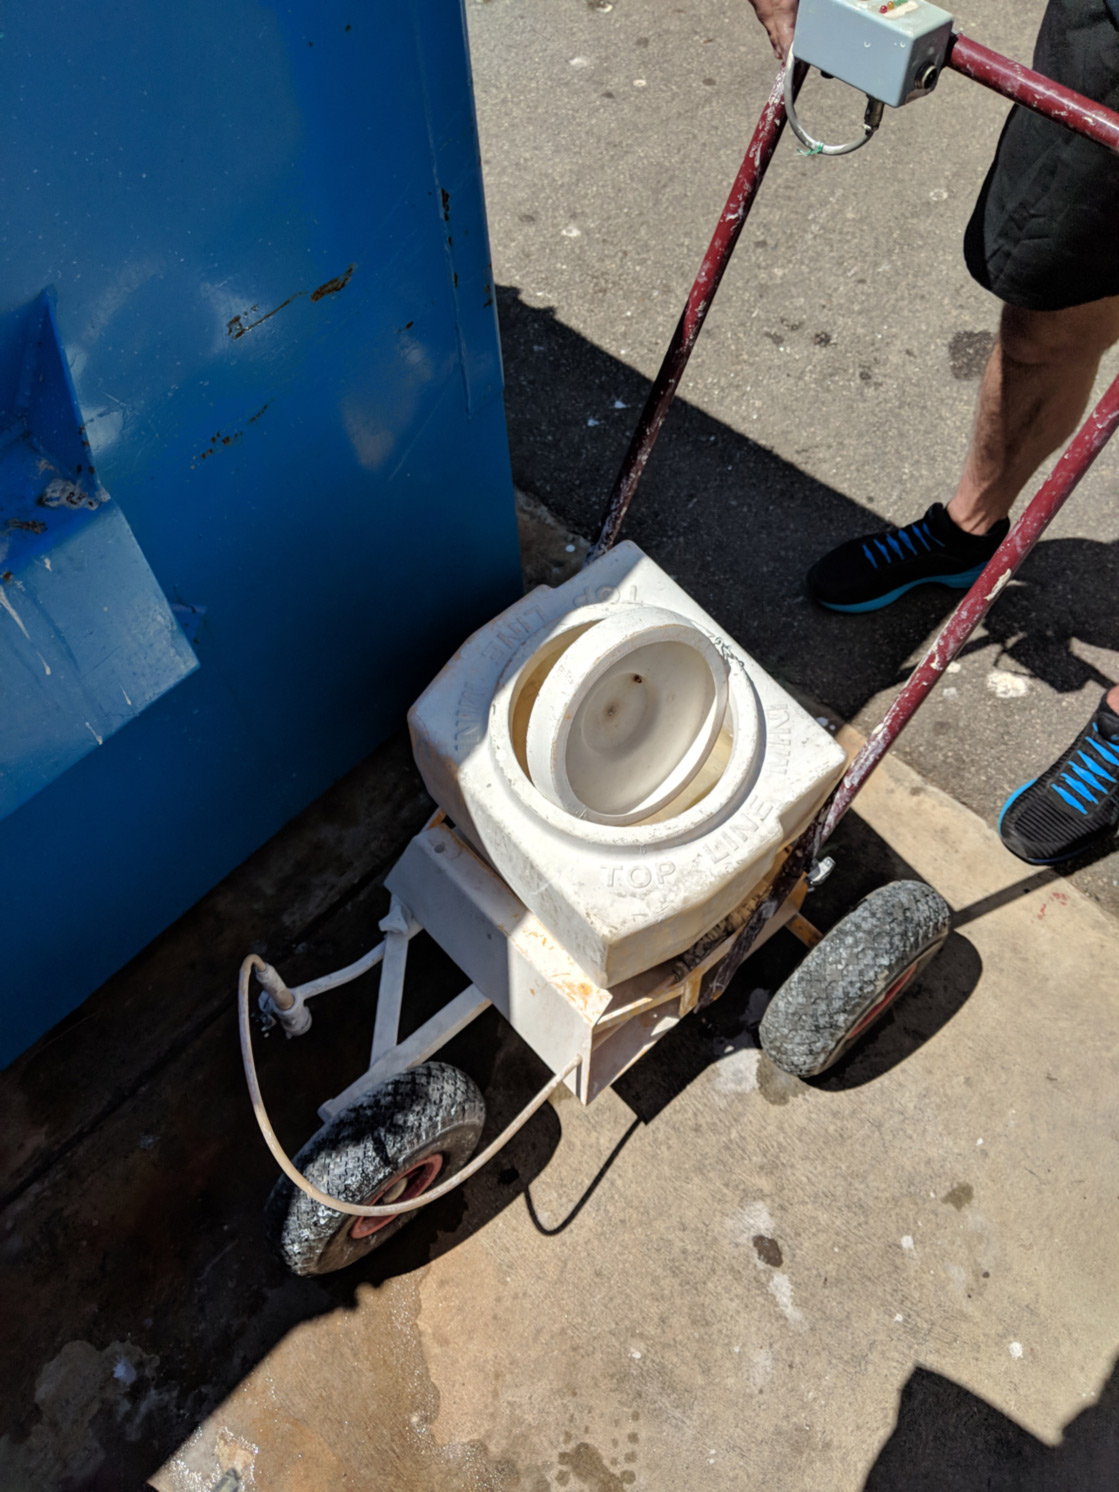 Broken line marking machine to repair